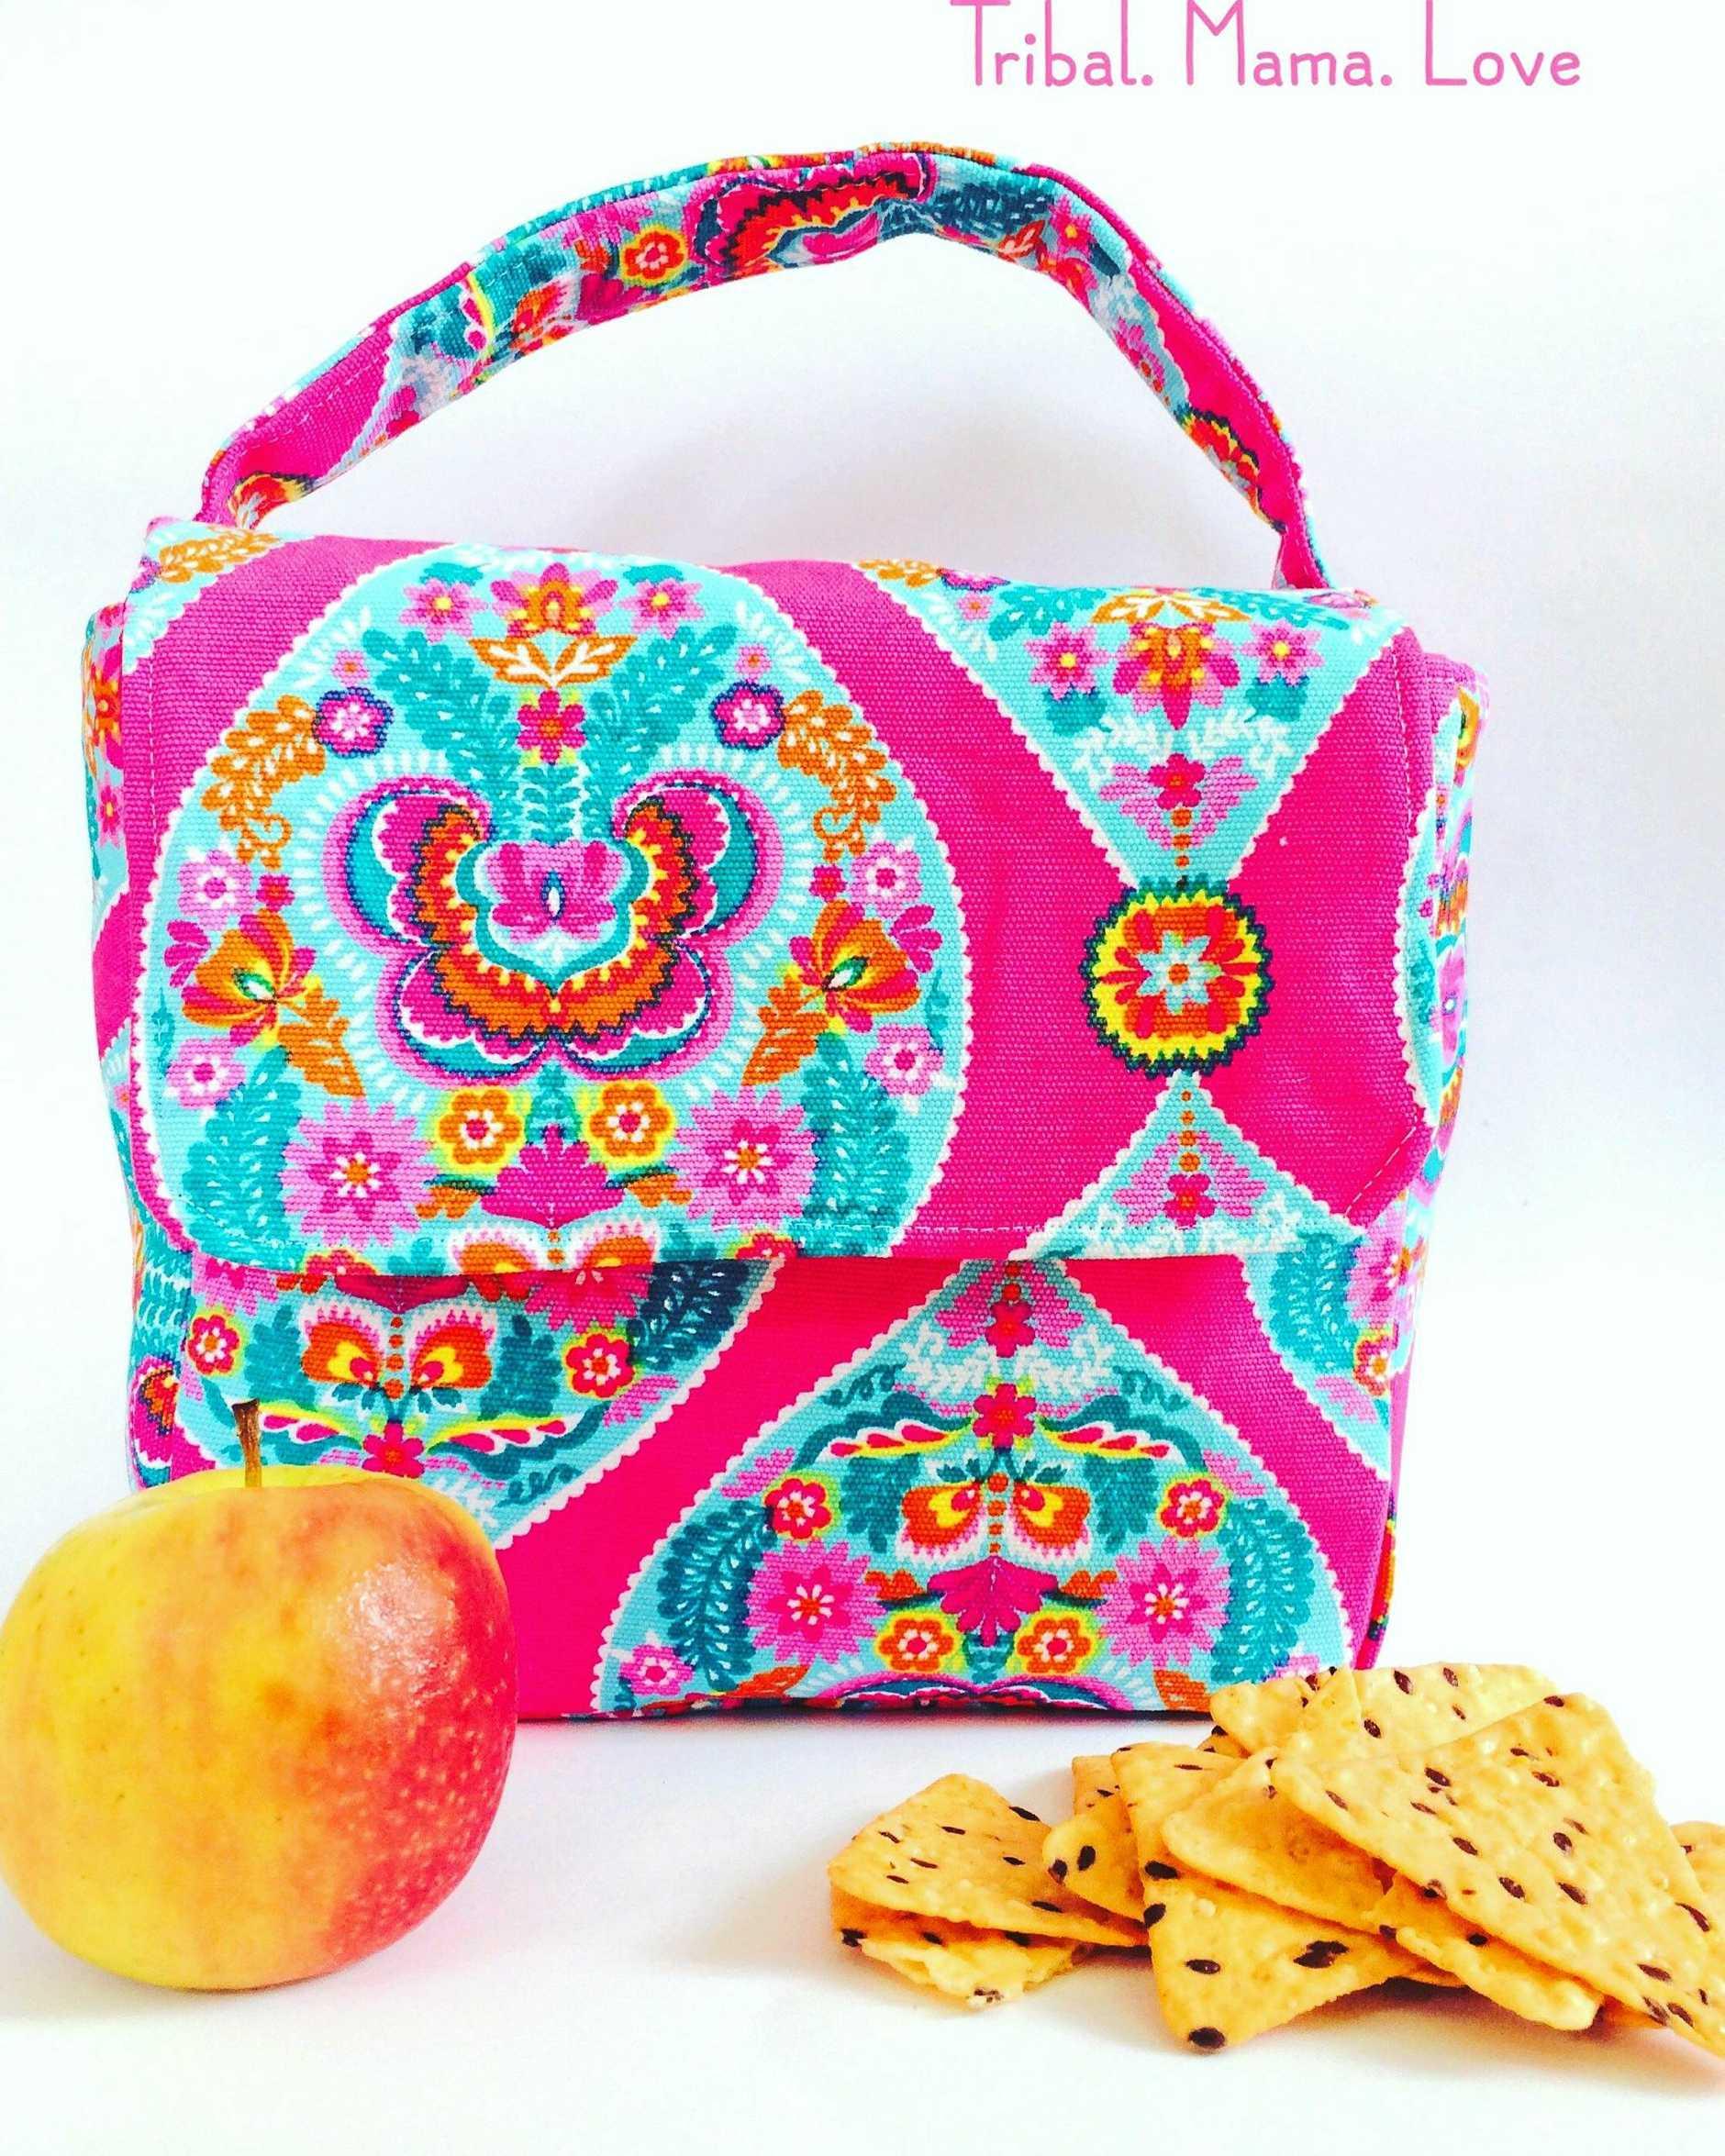 Tribal Mama Love products.